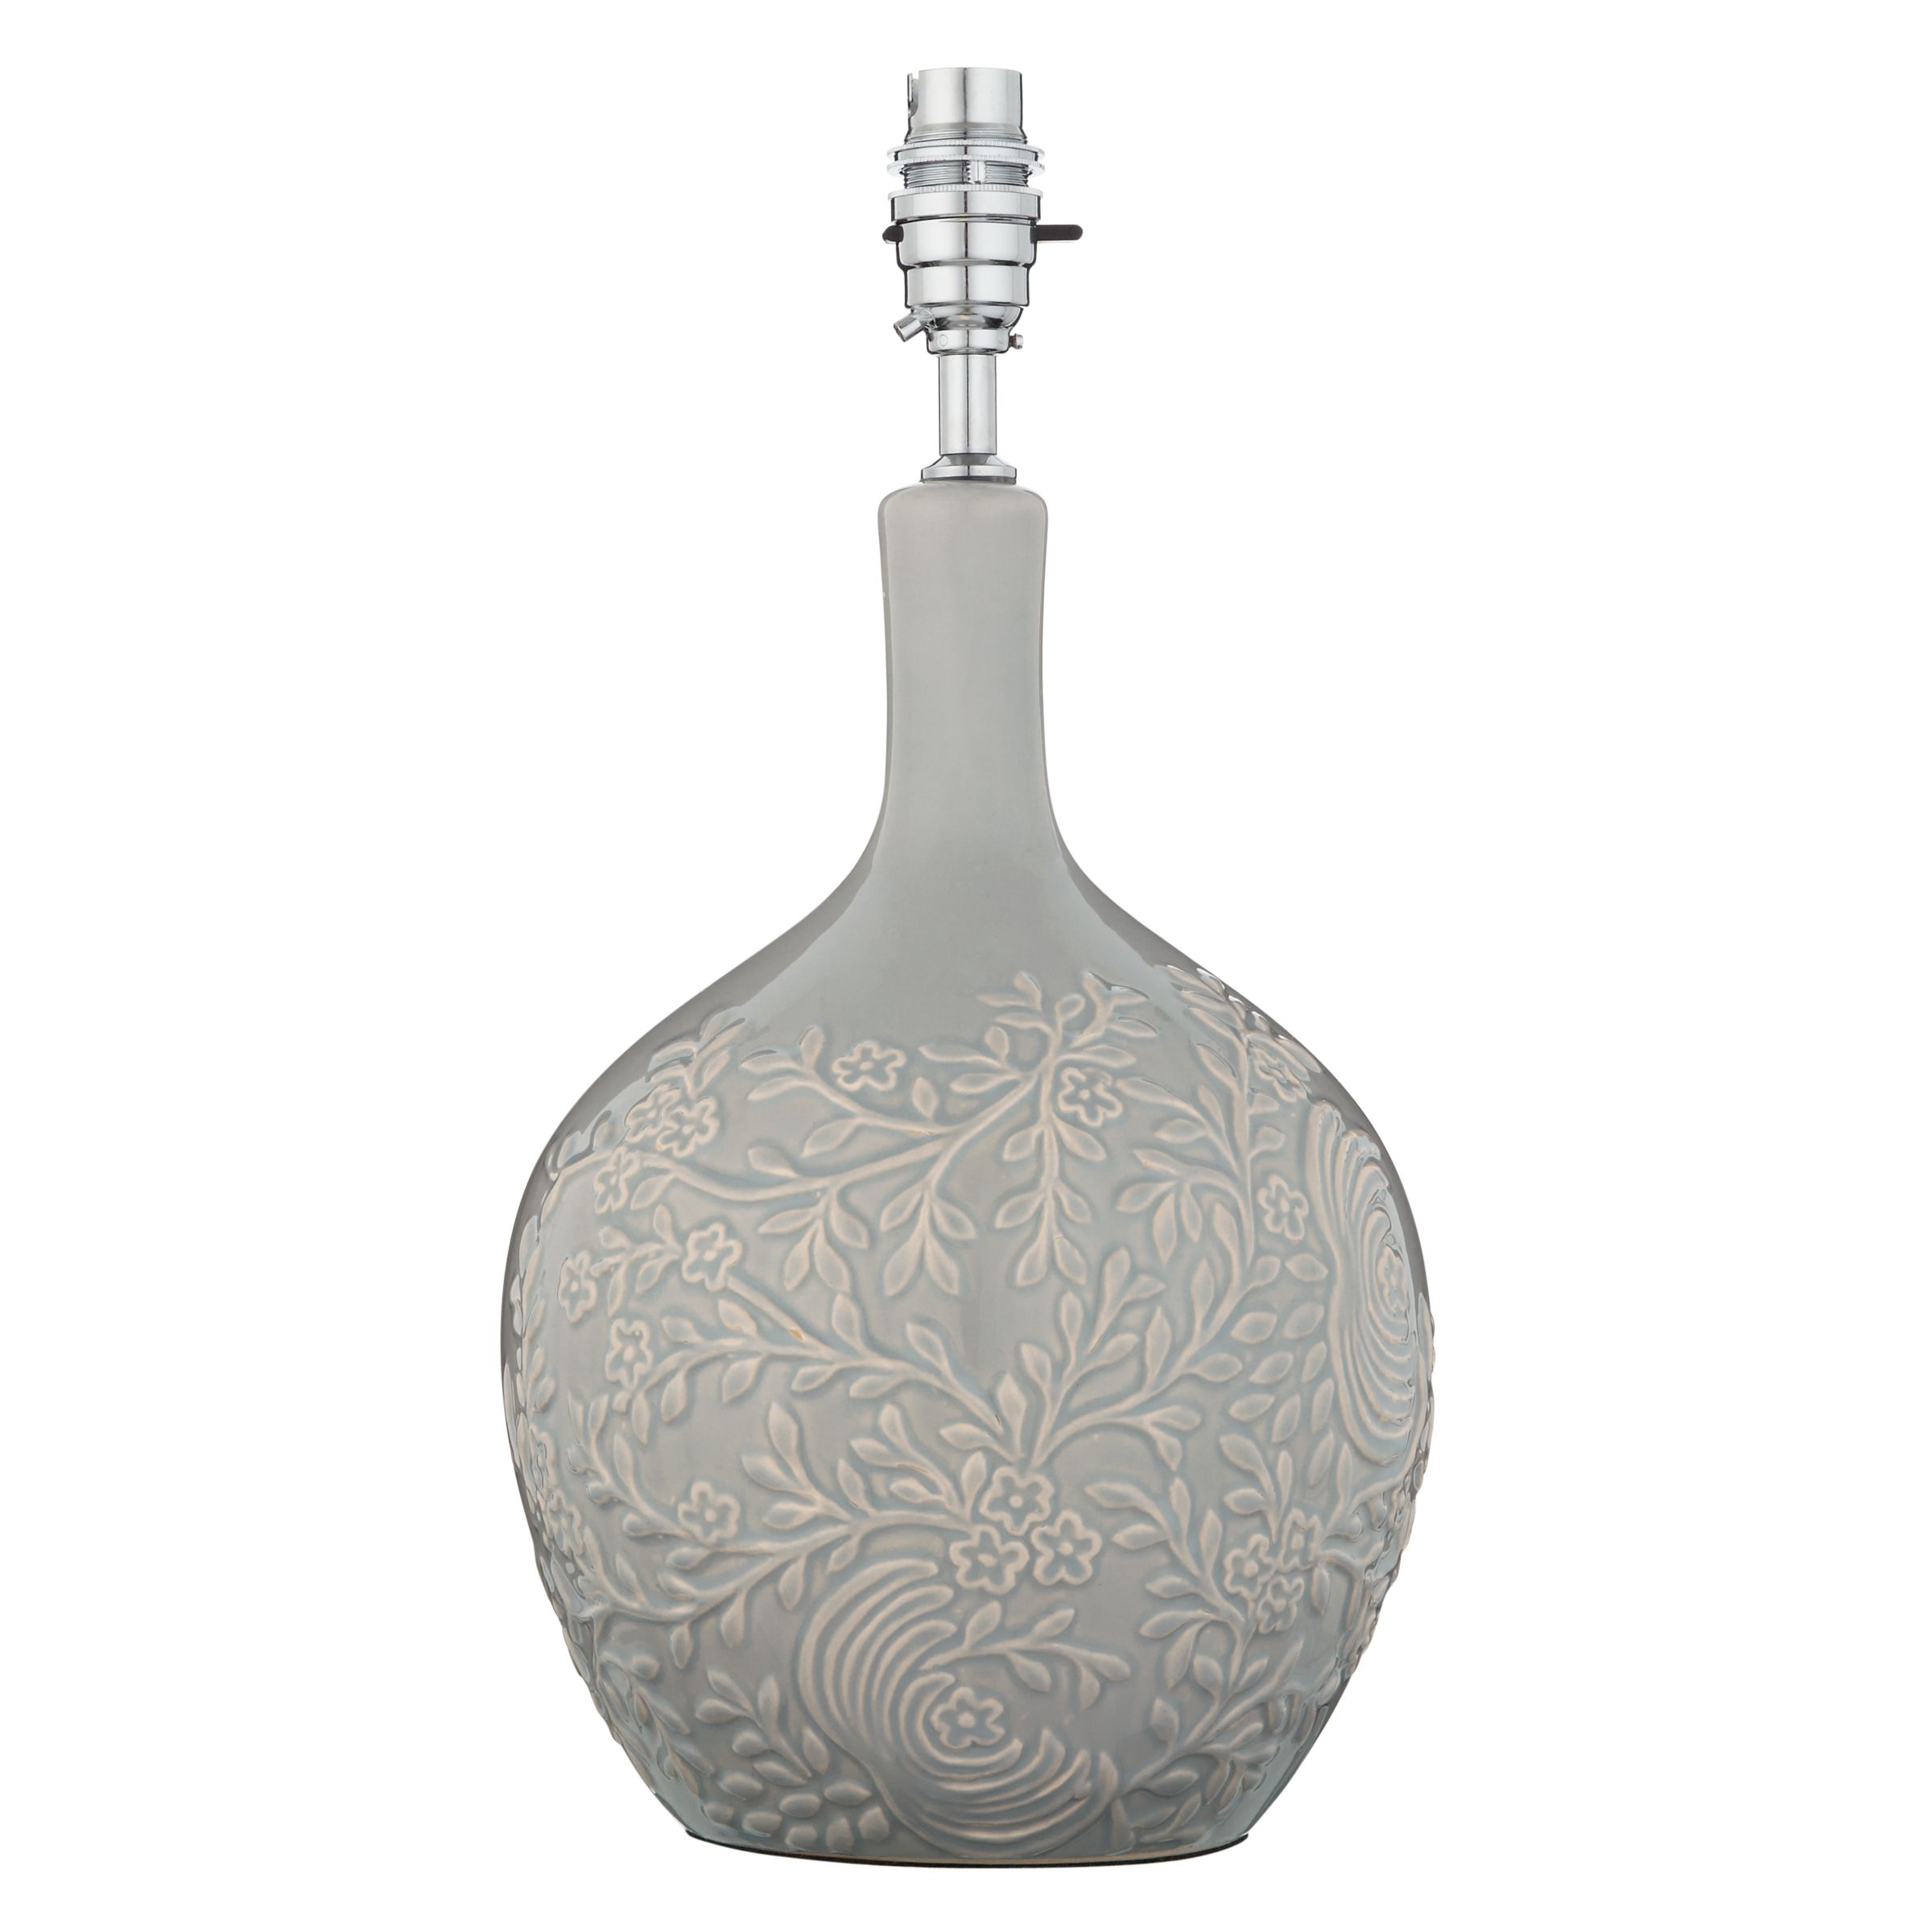 ceramic lamp base shop for cheap lighting and save online. Black Bedroom Furniture Sets. Home Design Ideas